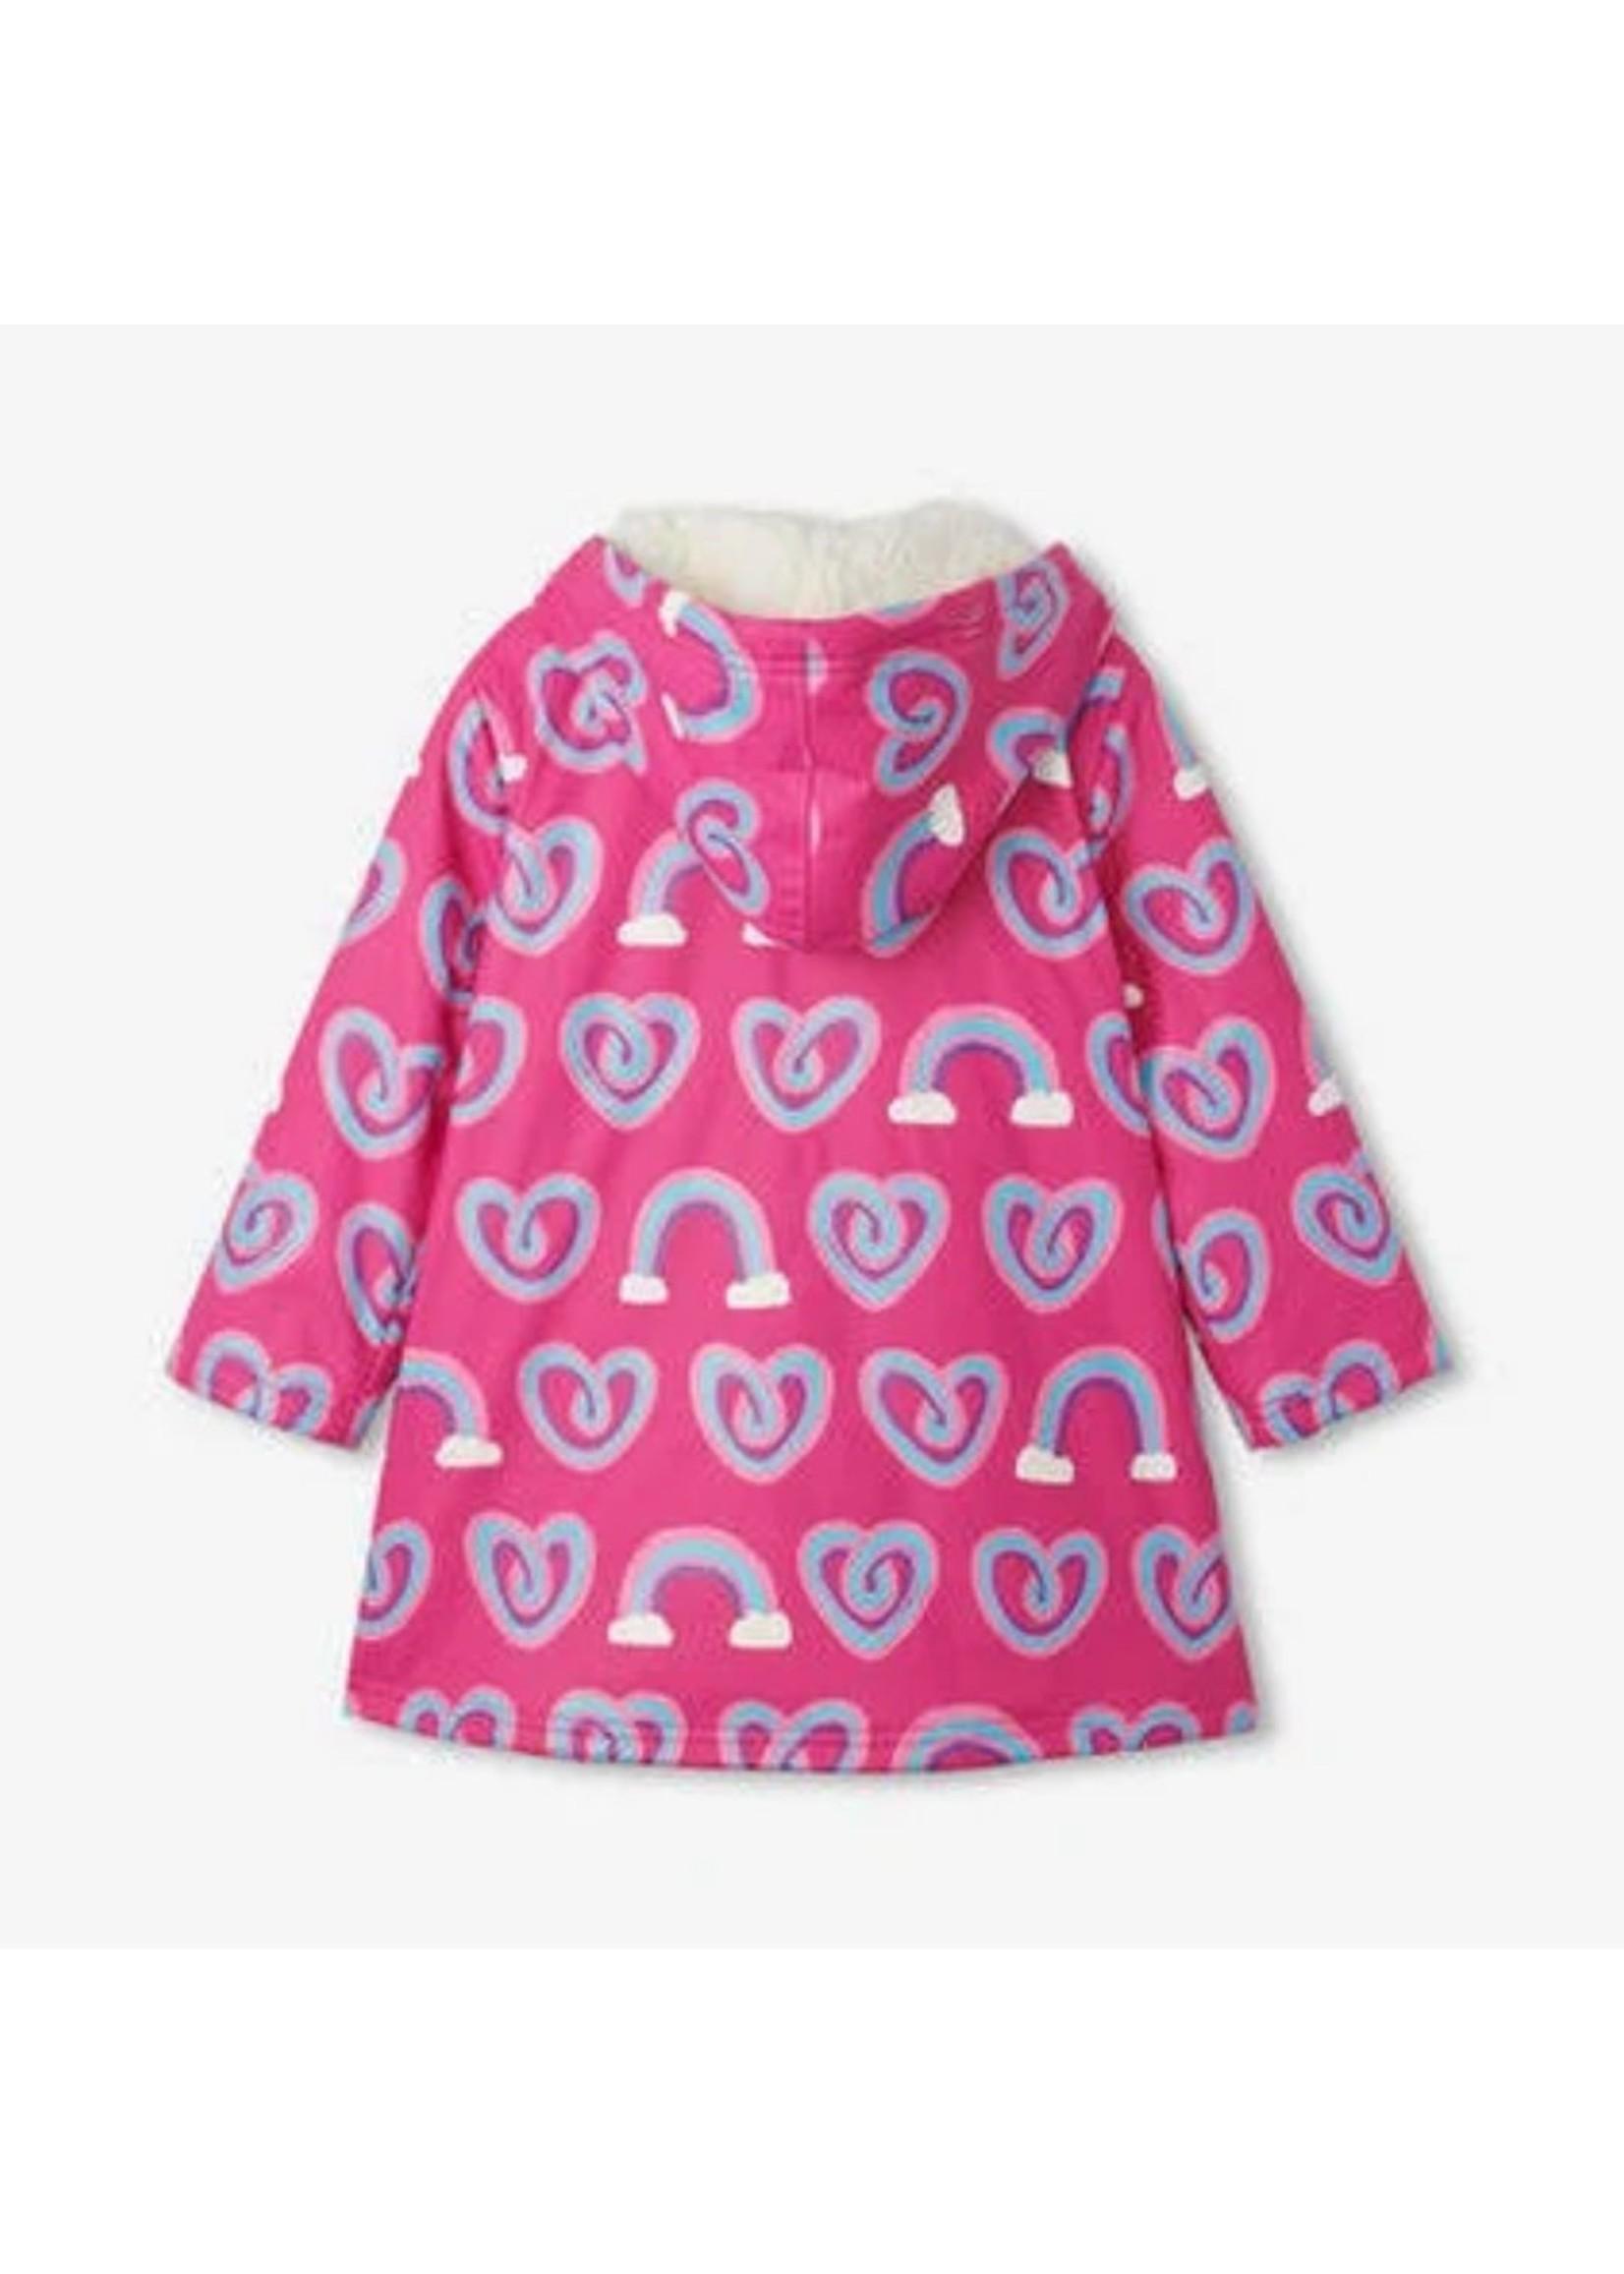 Hatley Hatley Twisty Heart Rain Jacket